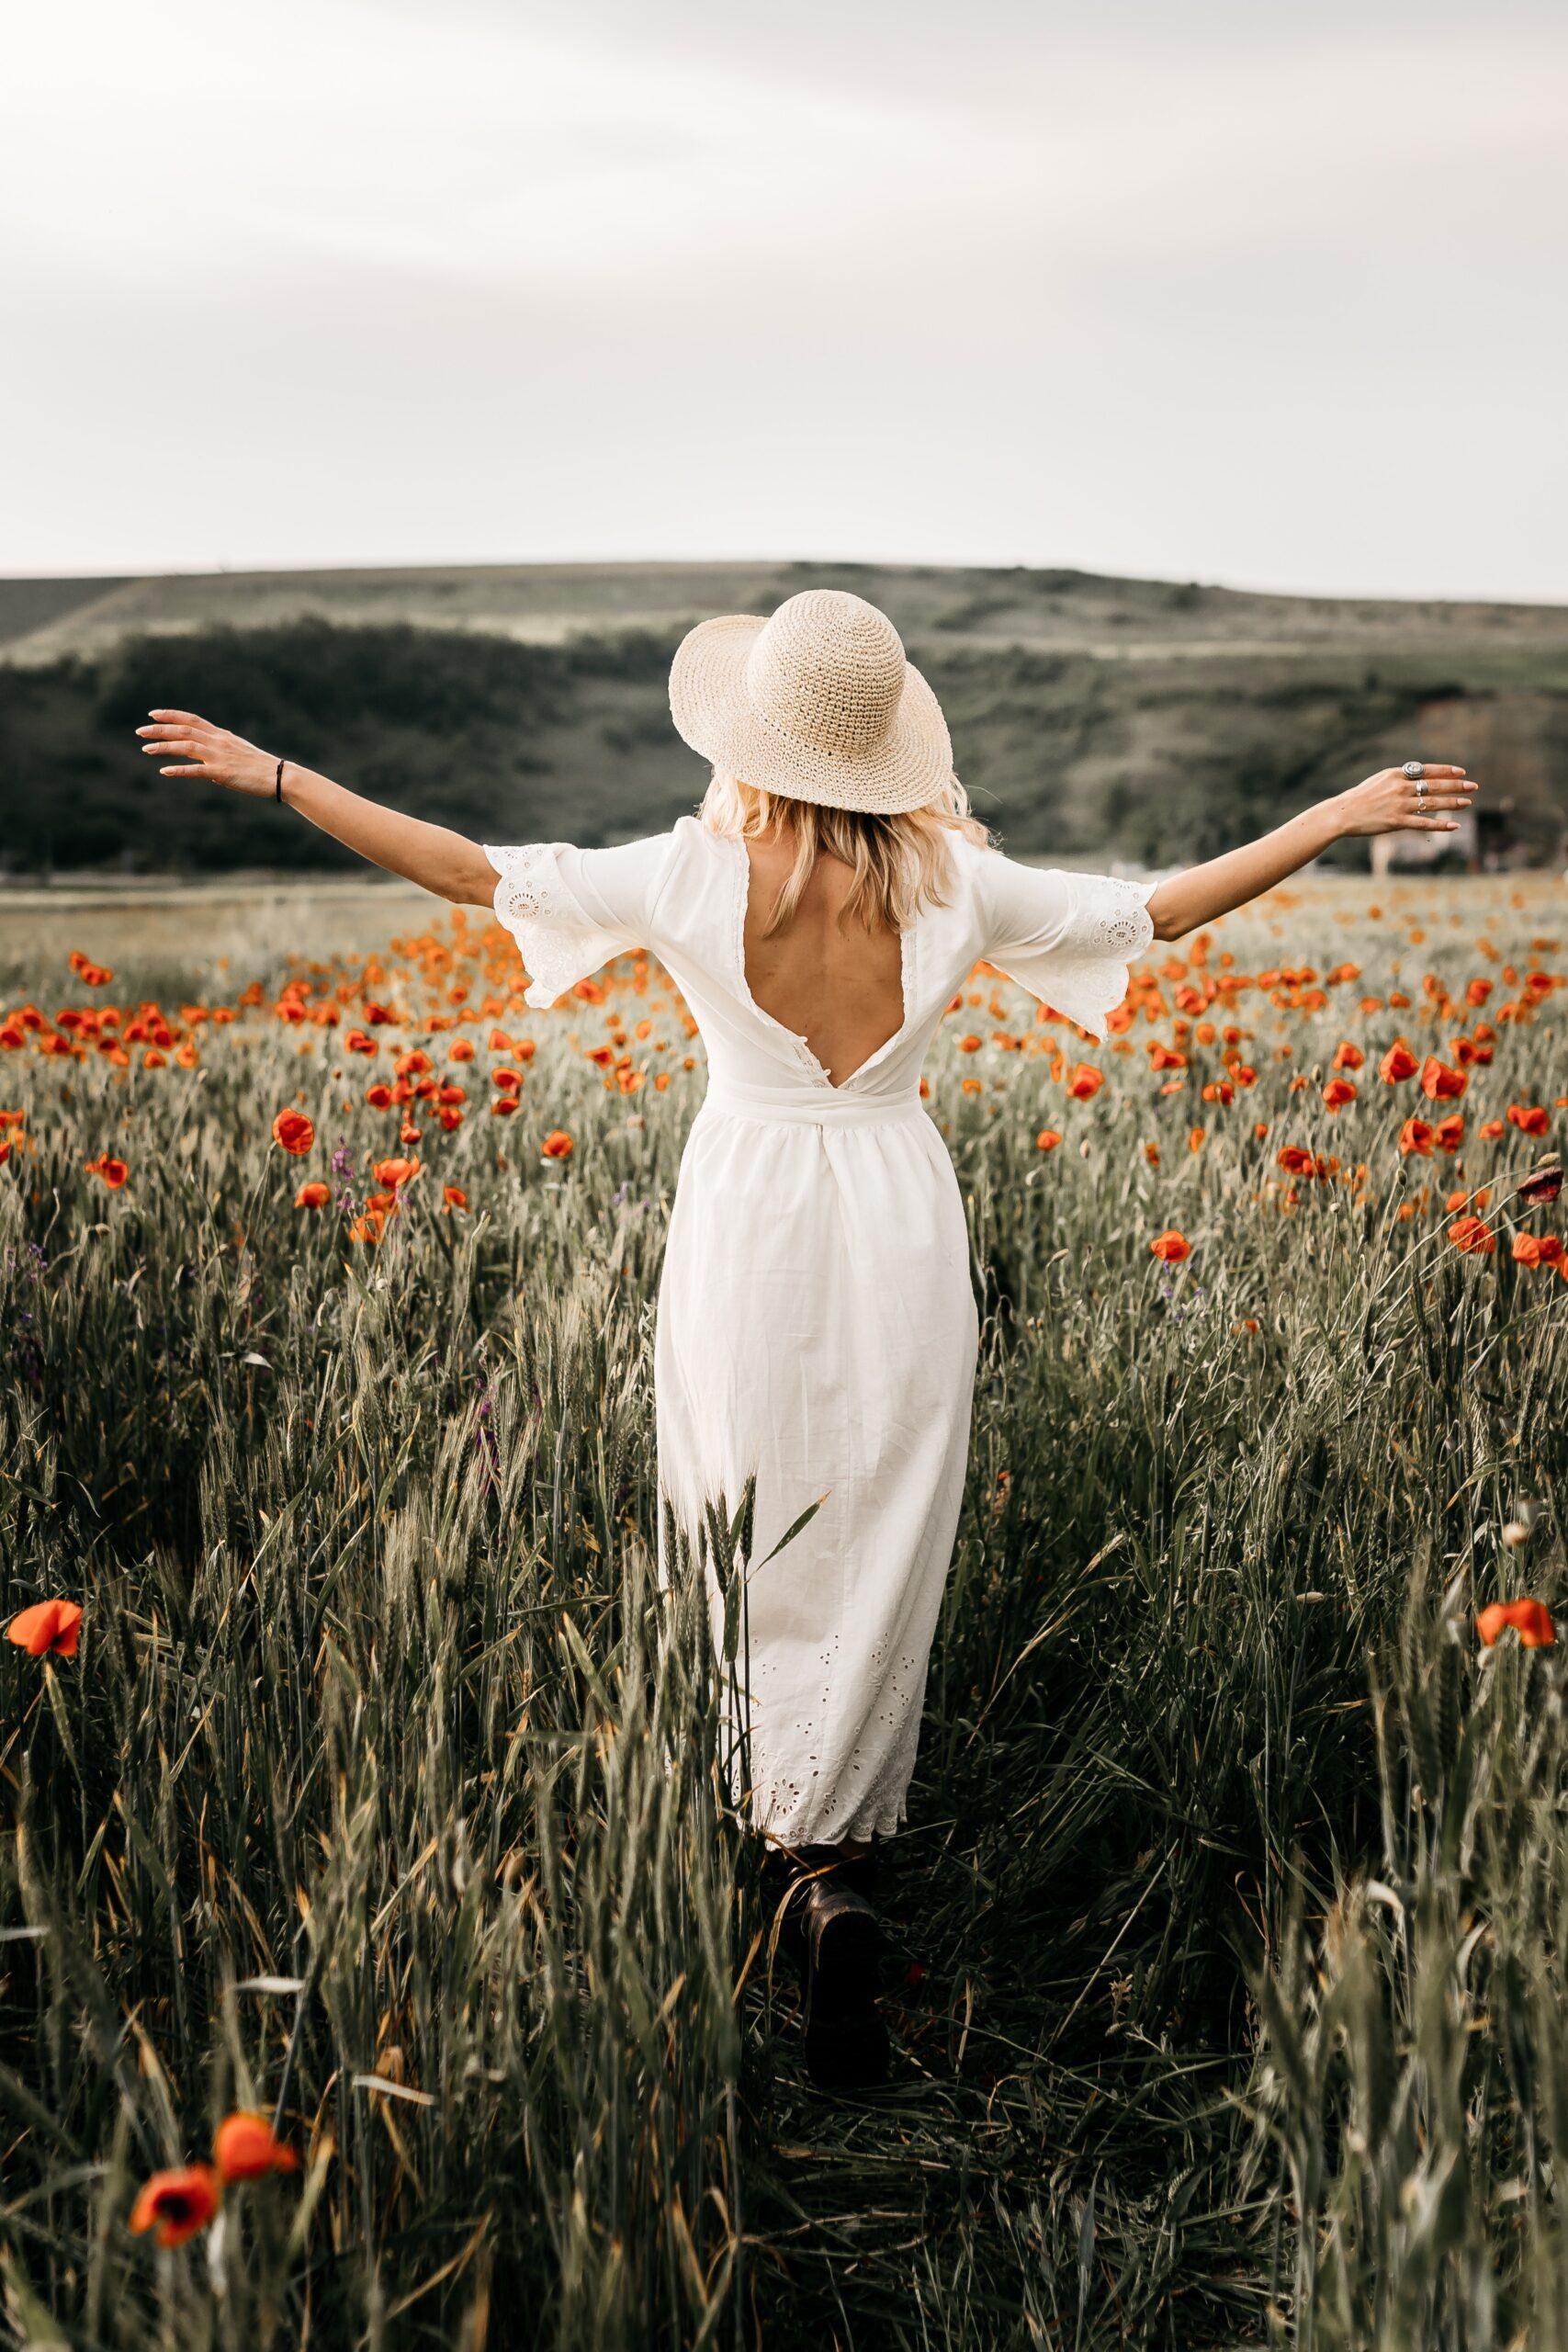 Girl in a white dress walking through a field